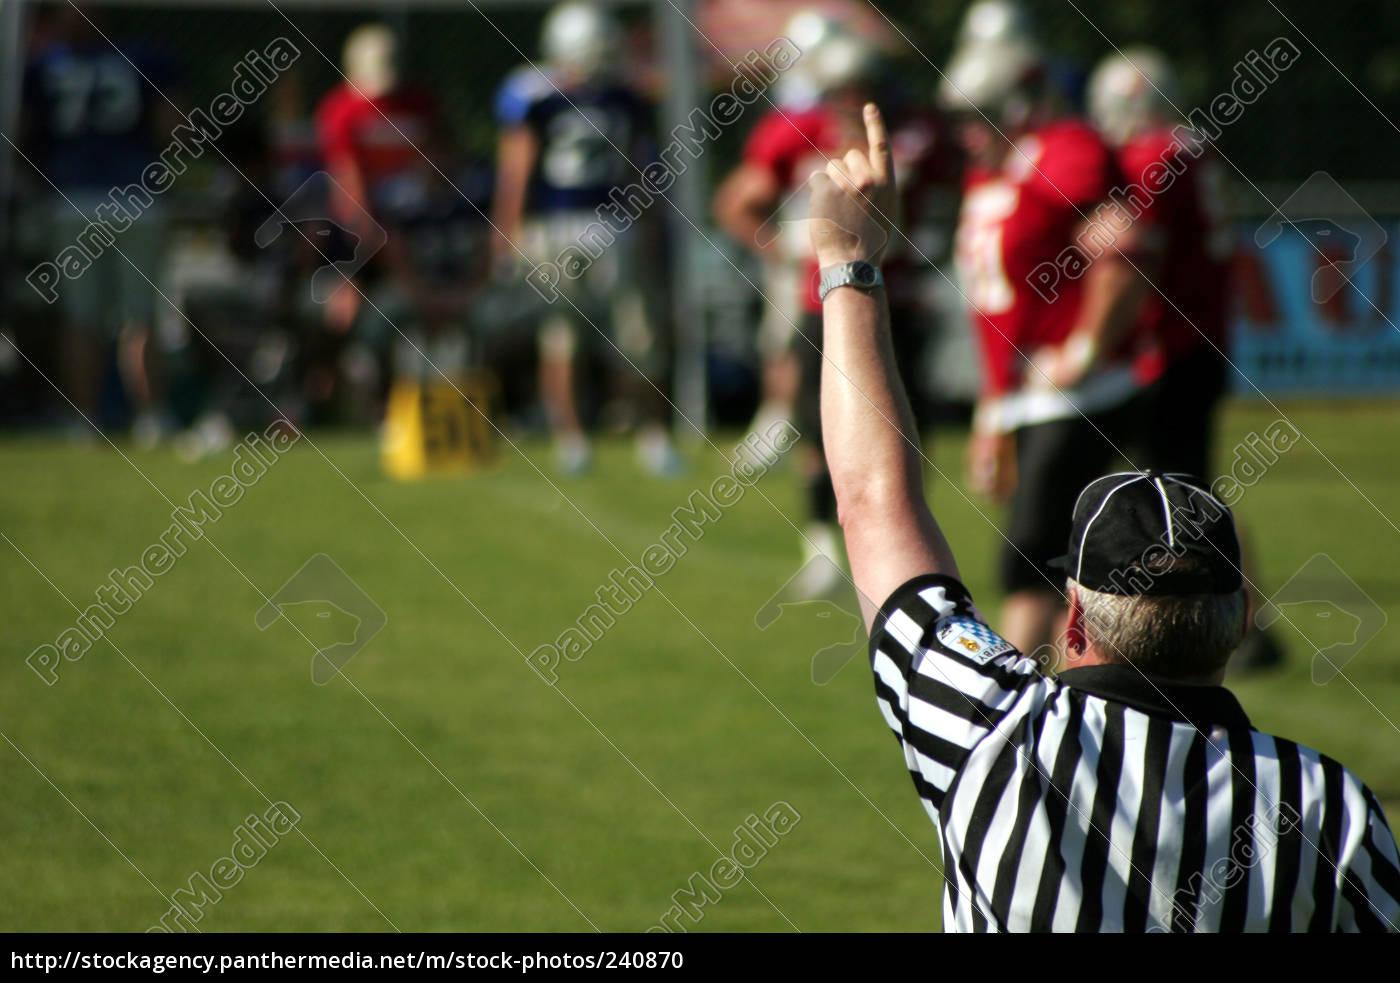 referee - 240870